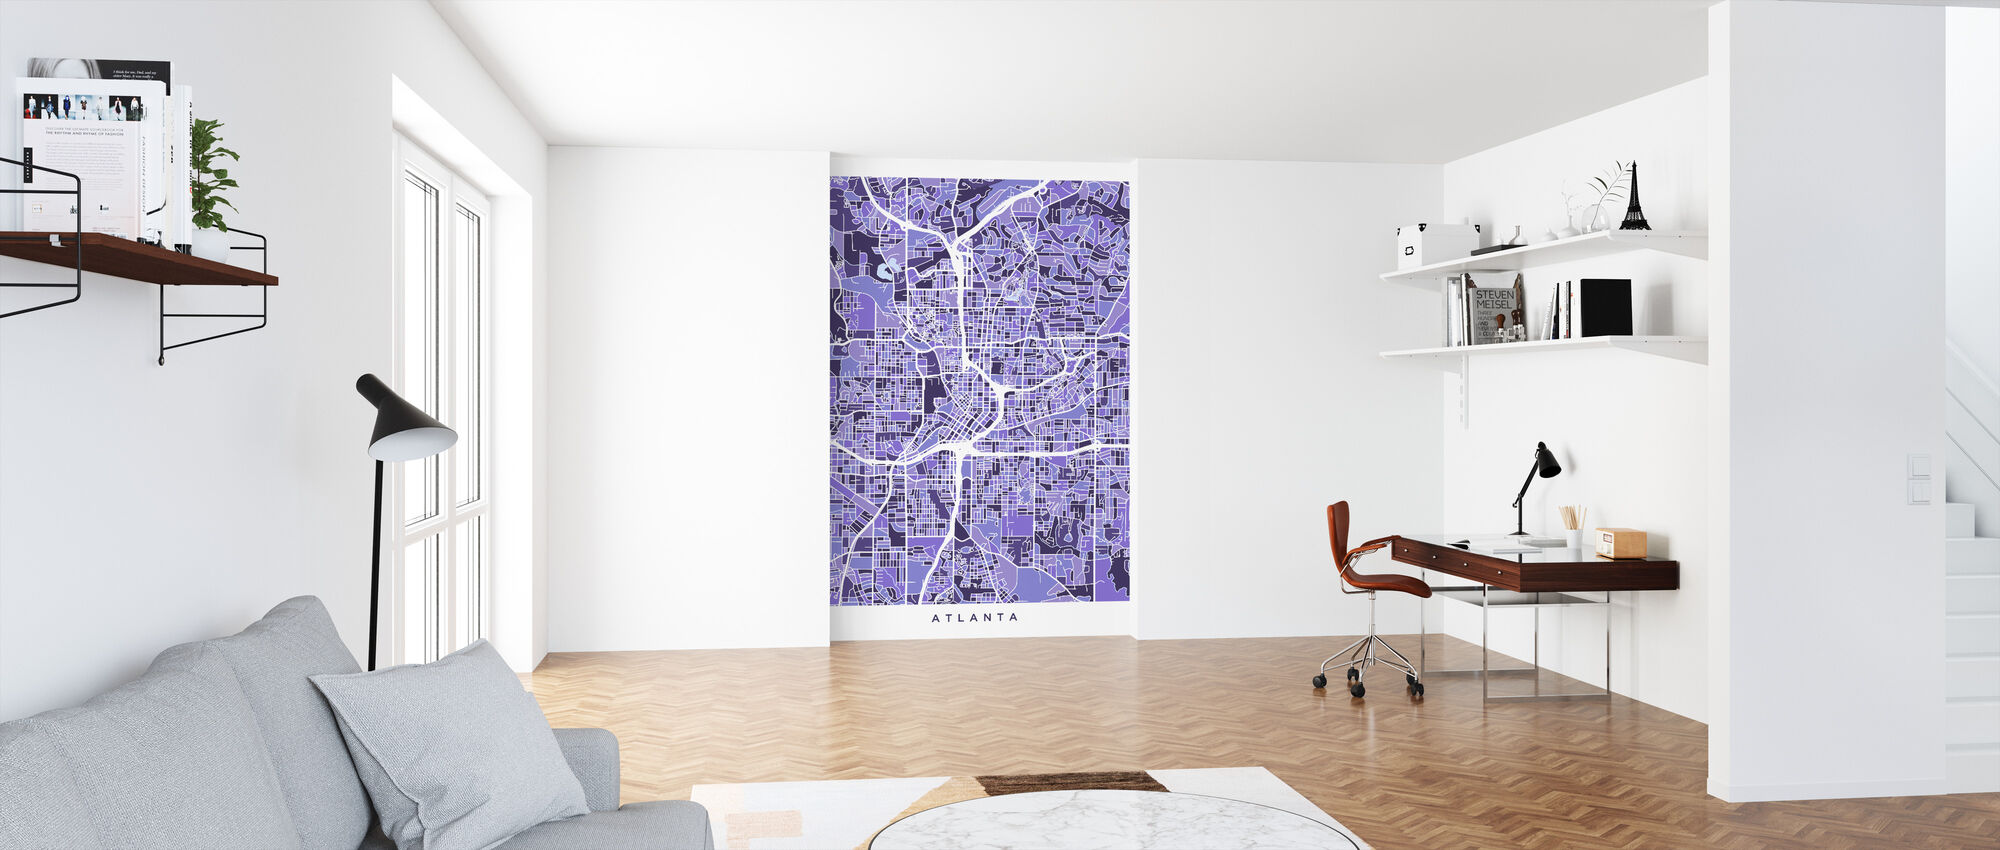 Atlanta Georgia City Map - Wallpaper - Office